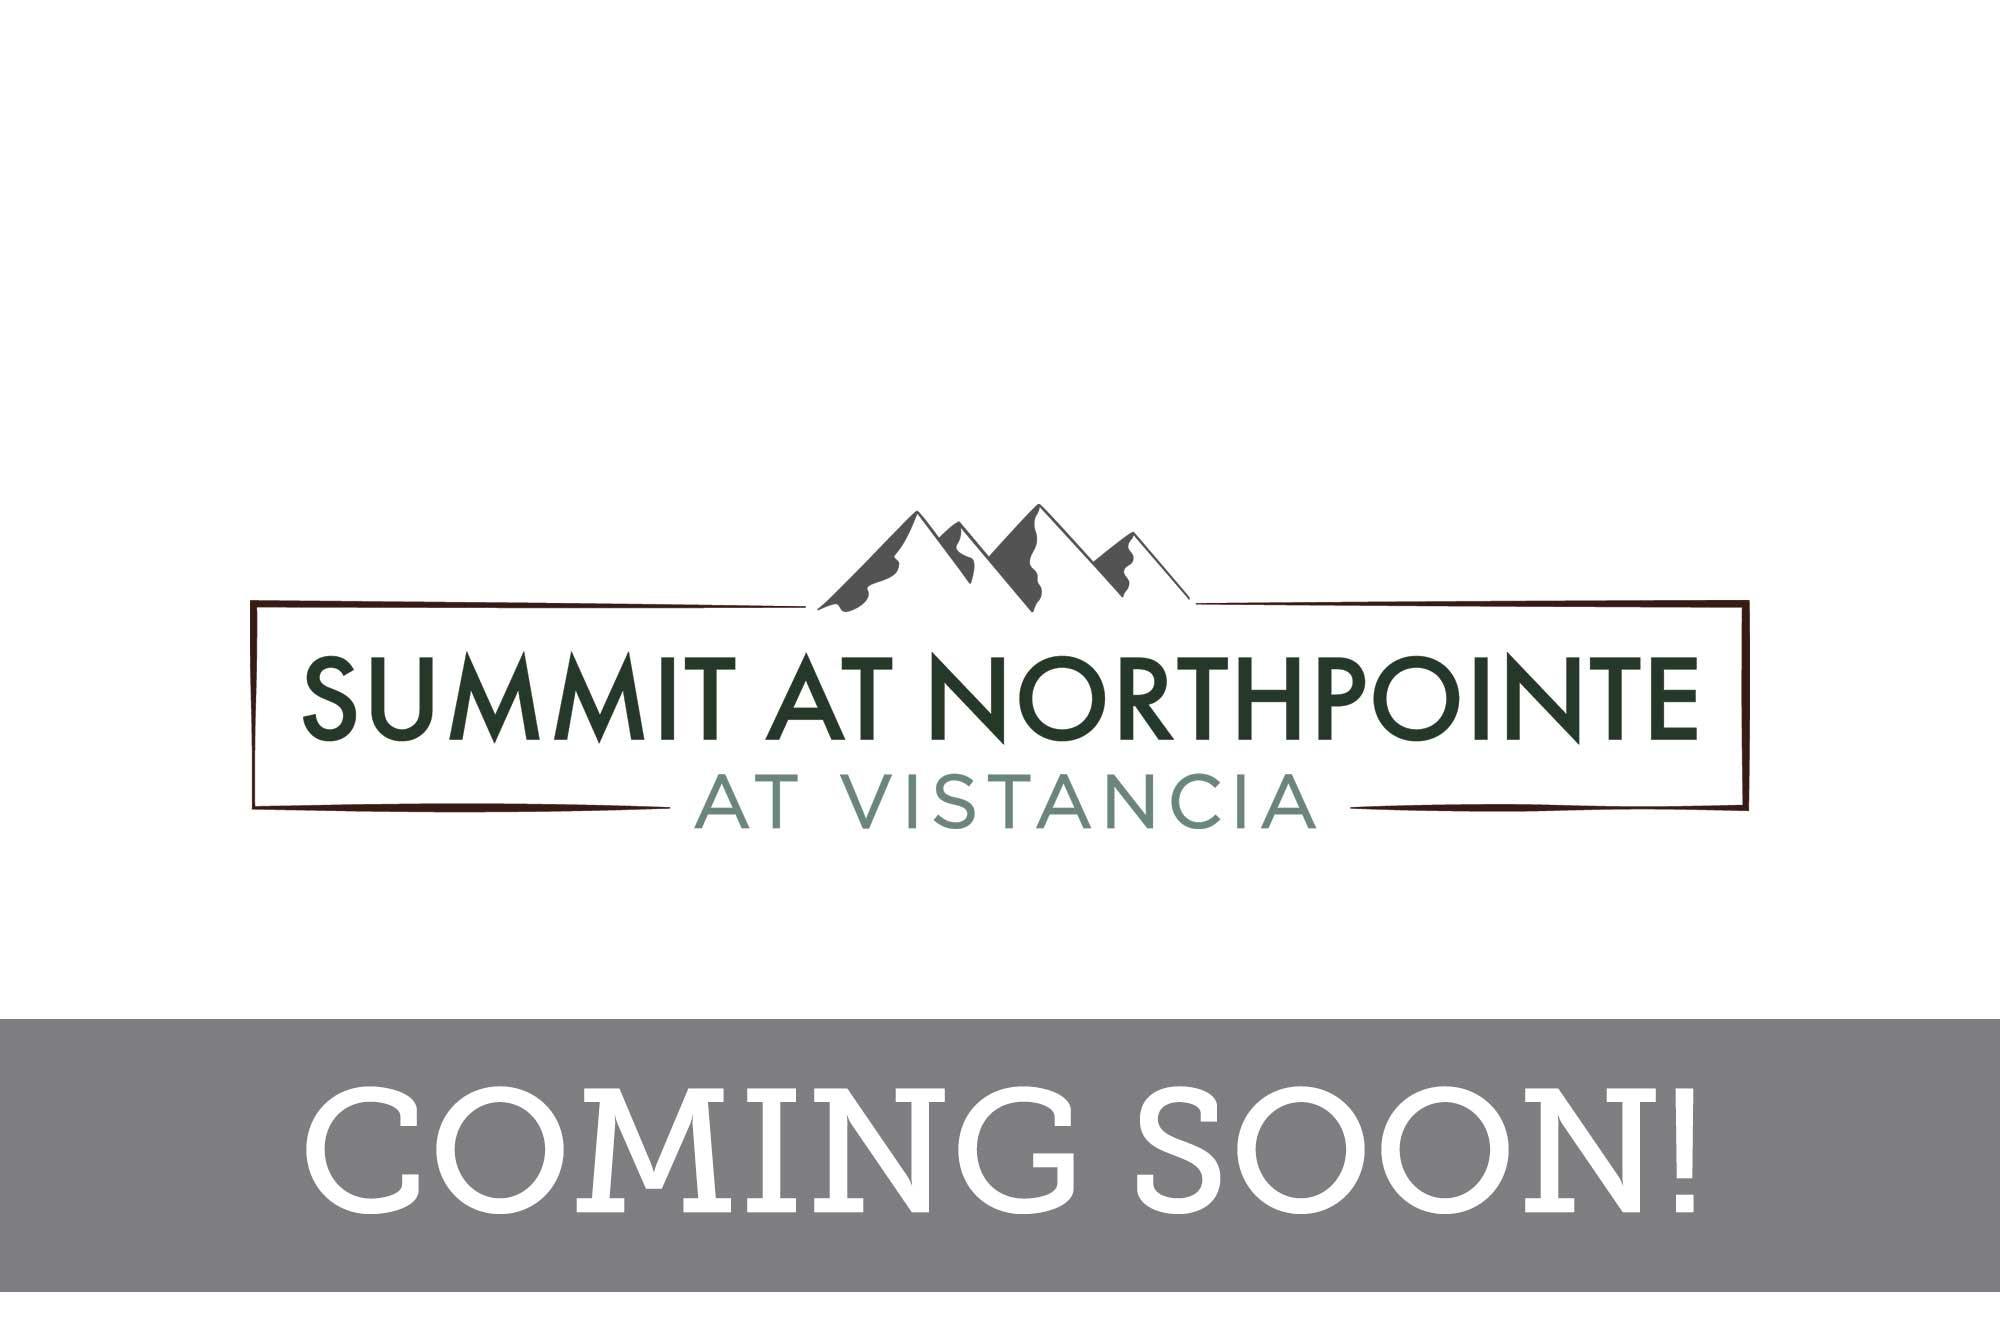 Summit at Northpointe at Vistancia - Coming Soon